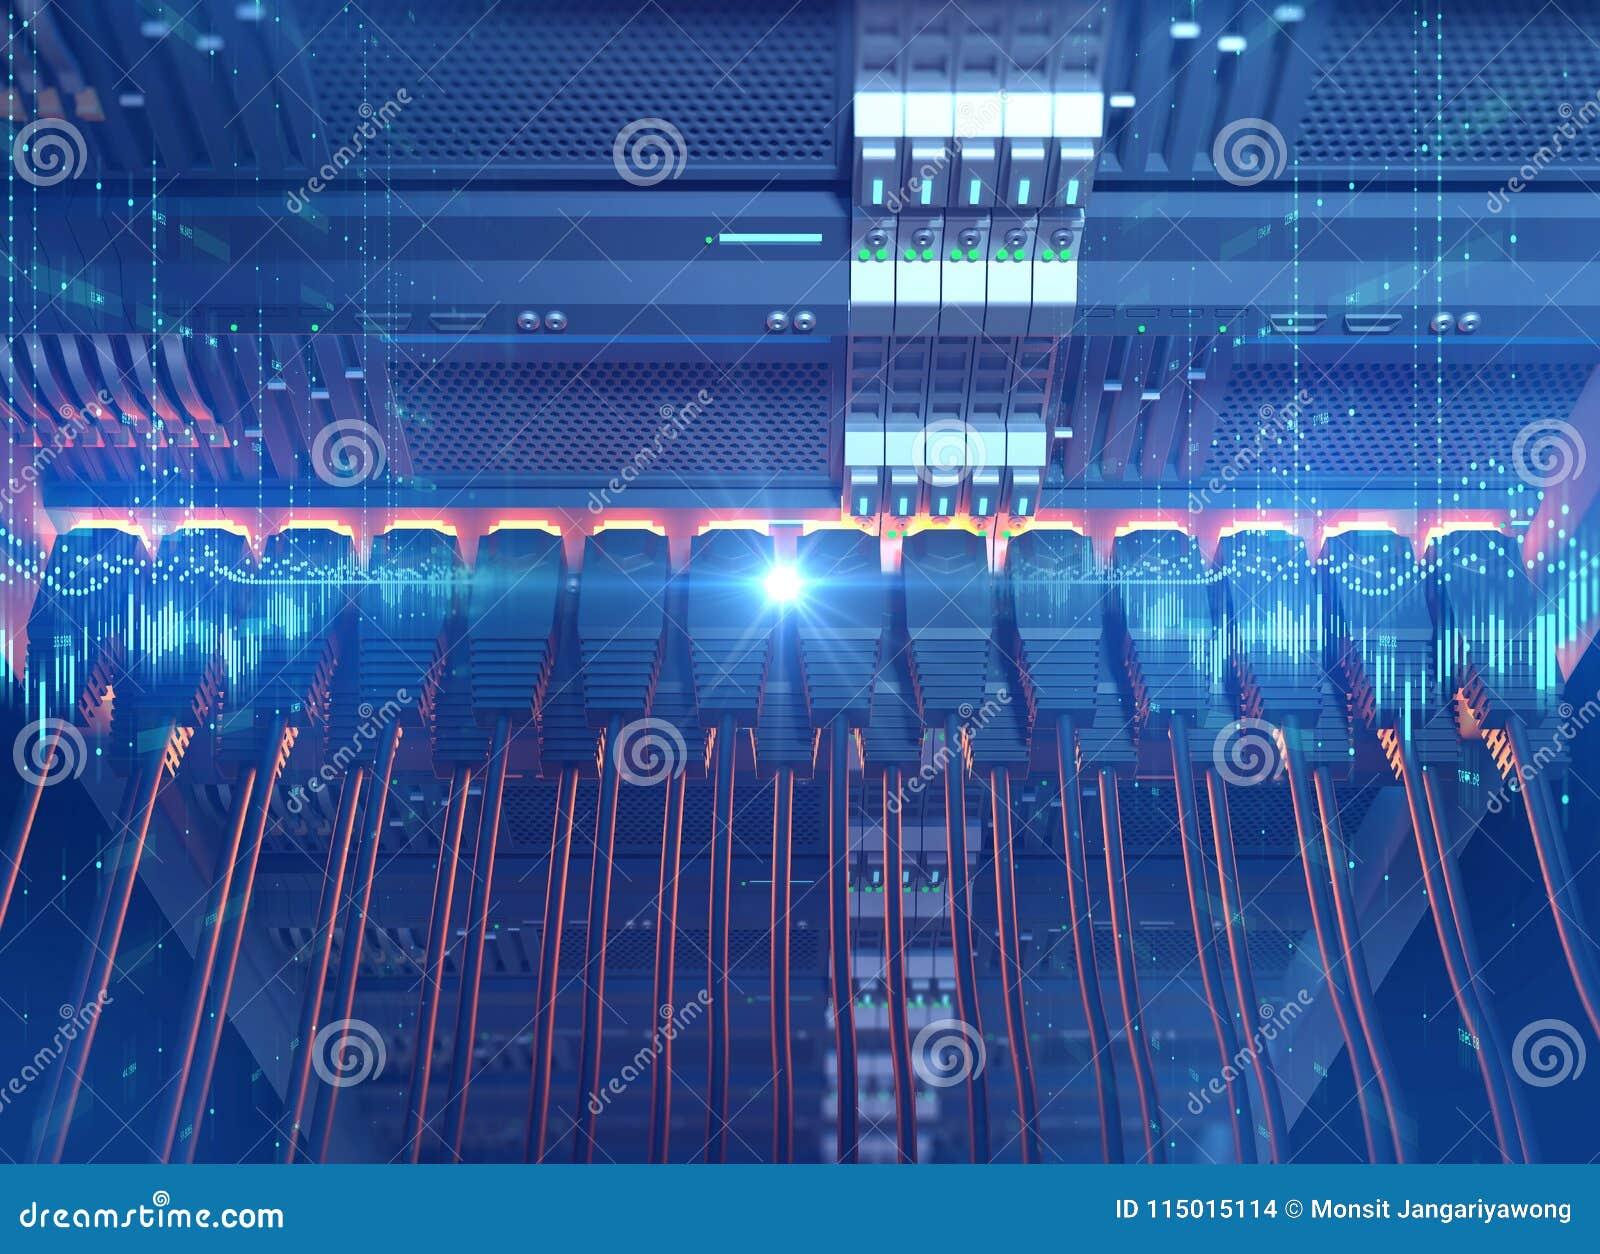 Ethernet Network Cables Connected To Internet Server 3d Illustra ...